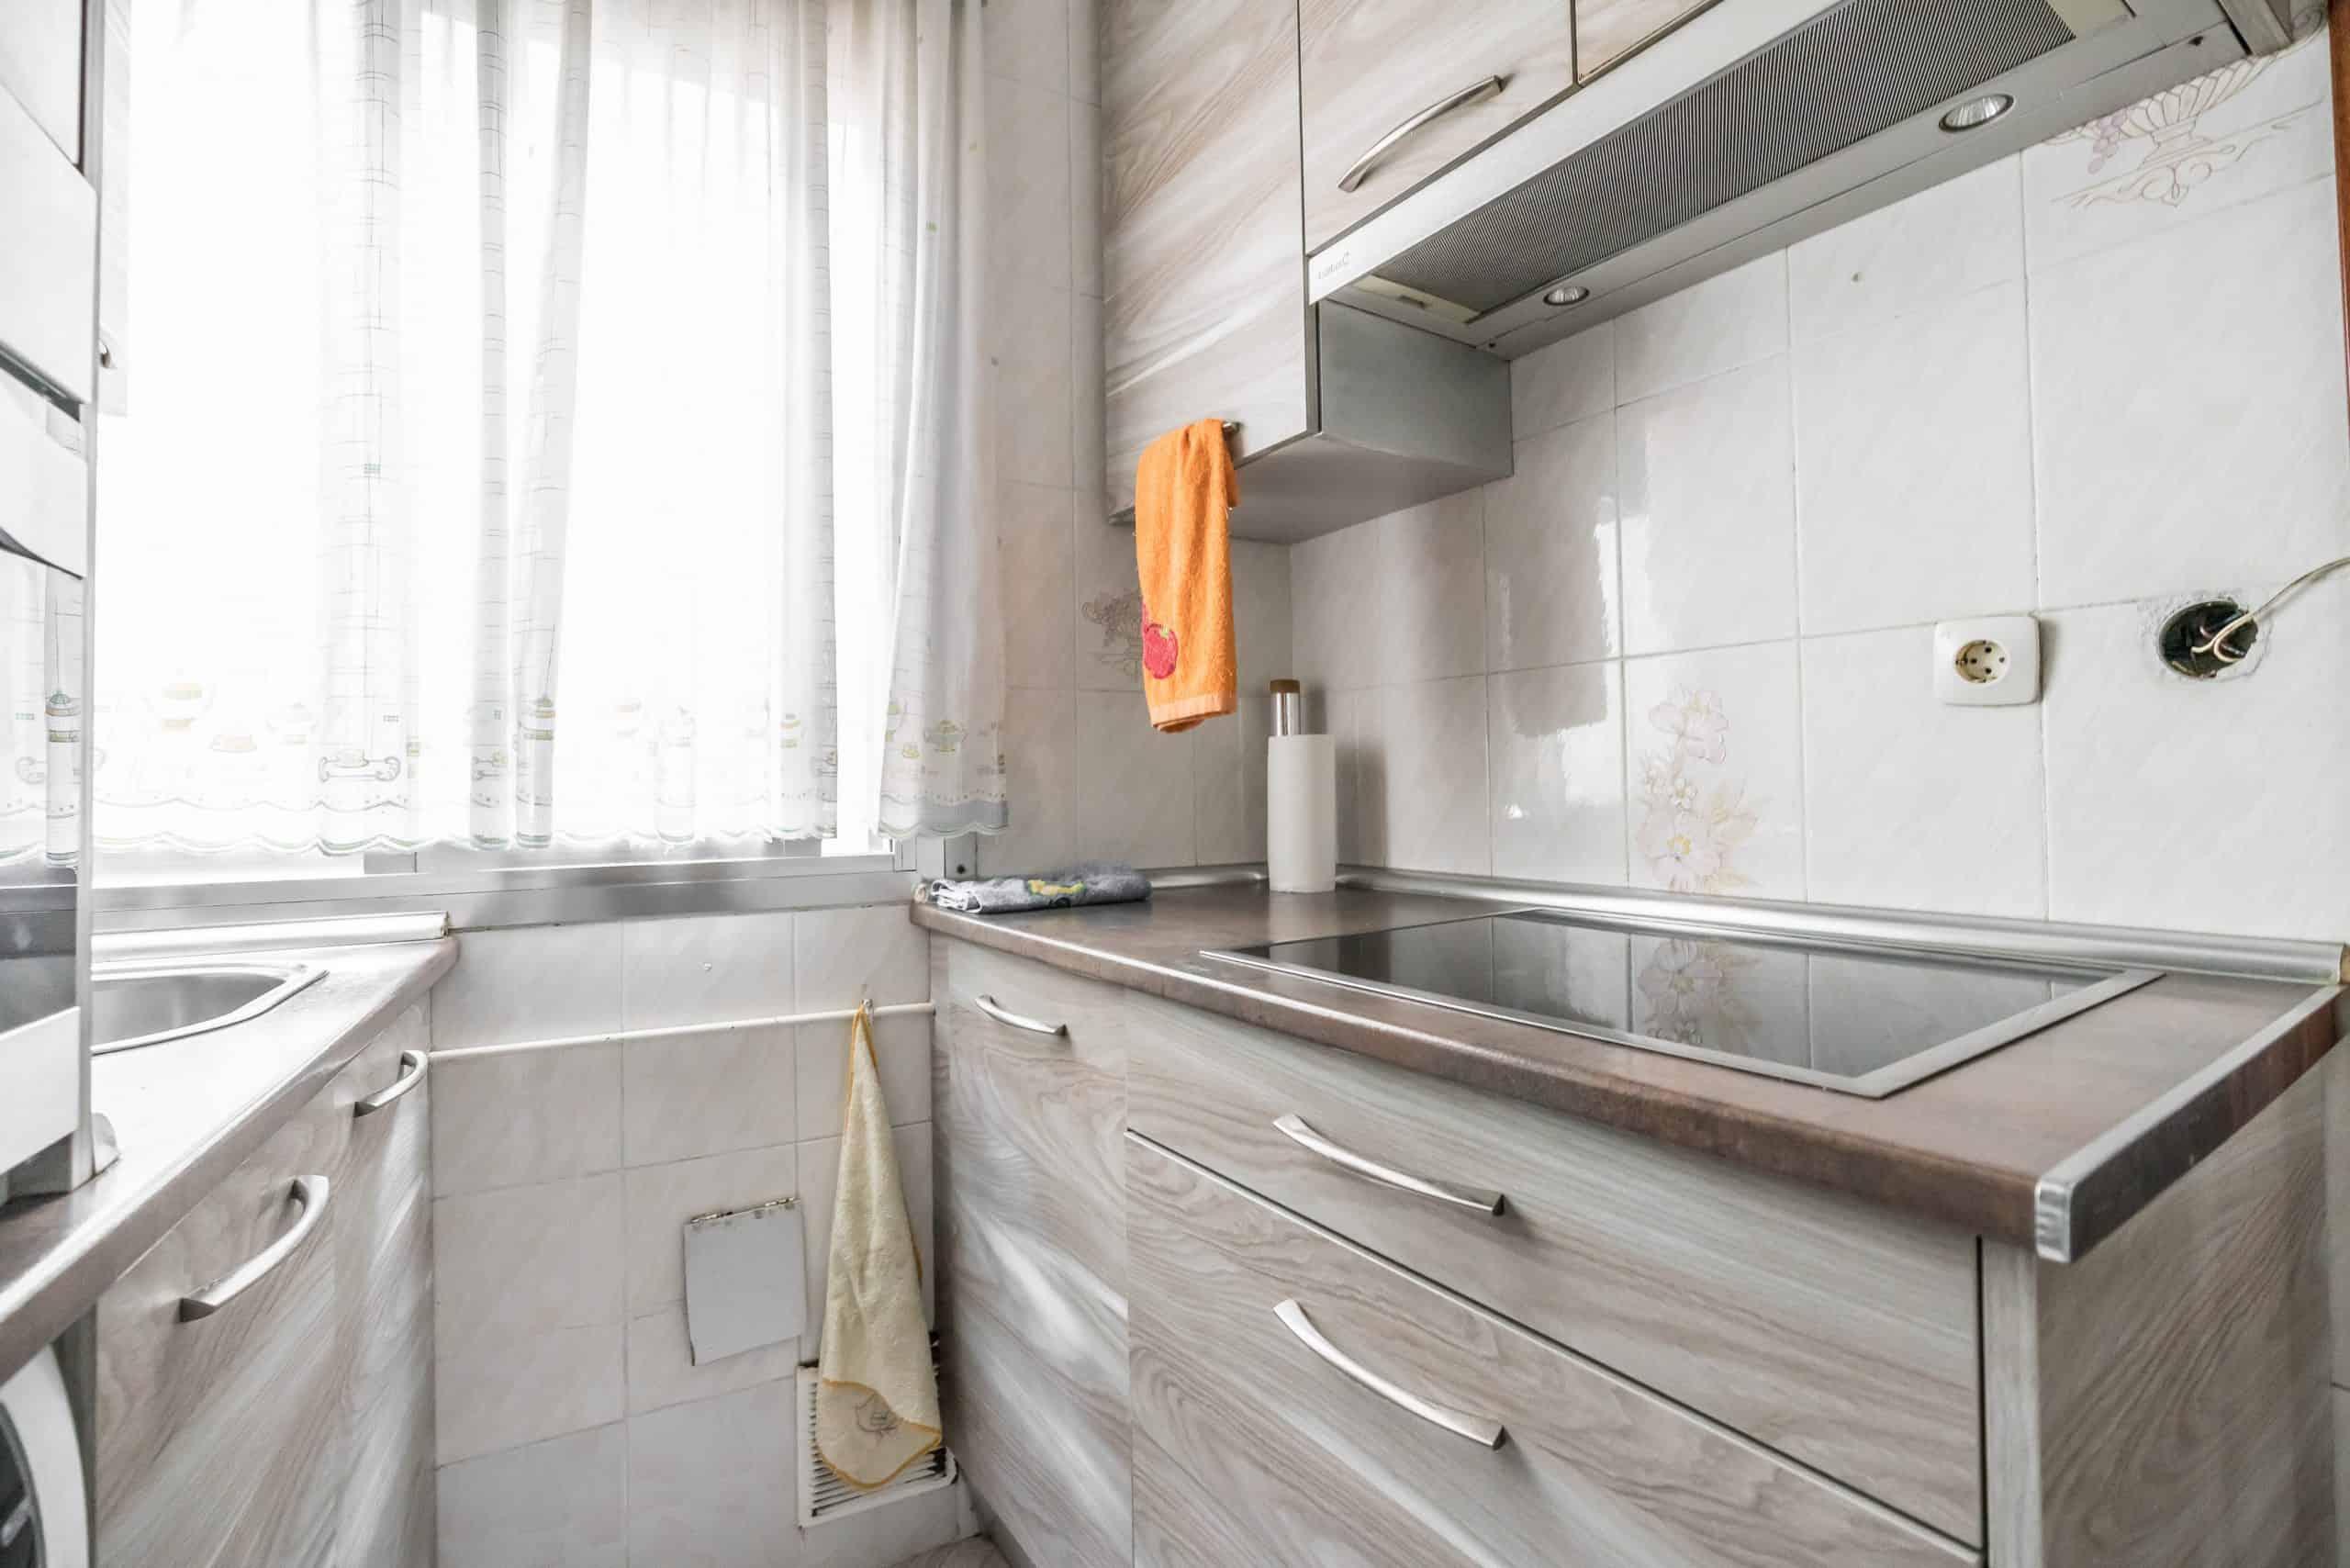 Agencia Inmobiliaria de Madrid-FUTUROCASA-Zona ARGANZUELA-EMBAJADORES-LEGAZPI5 COCINA (6)